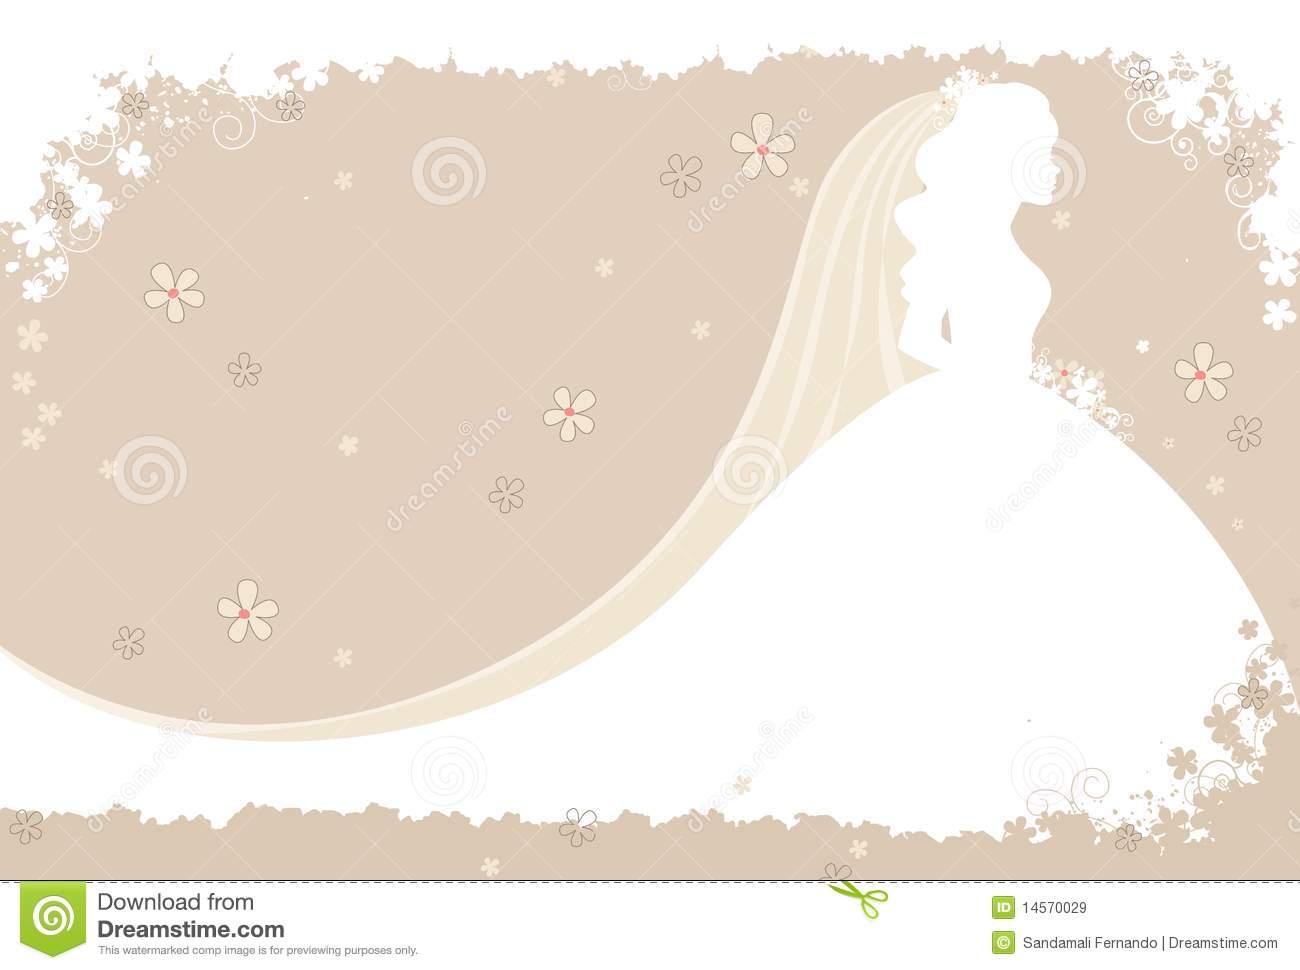 Bridal shower invitations background free backgrounds for bridal shower invitations 1300 x 970 filmwisefo